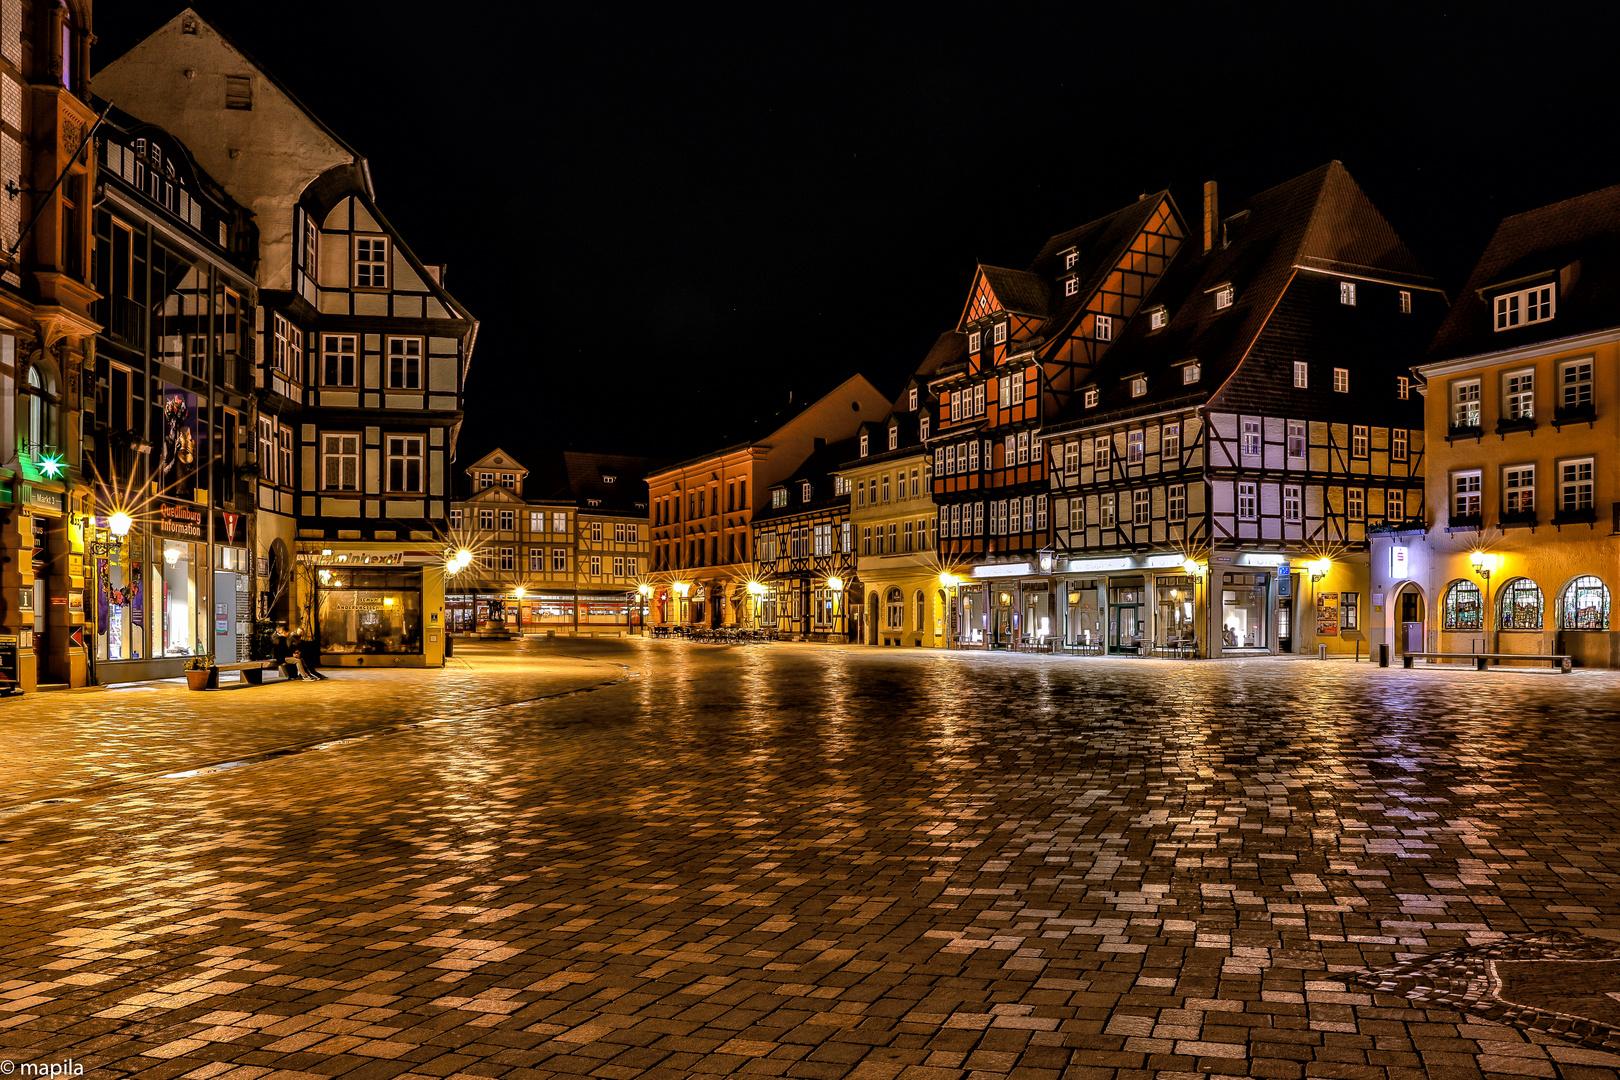 ——— Quedlinburg Marktplatz ———